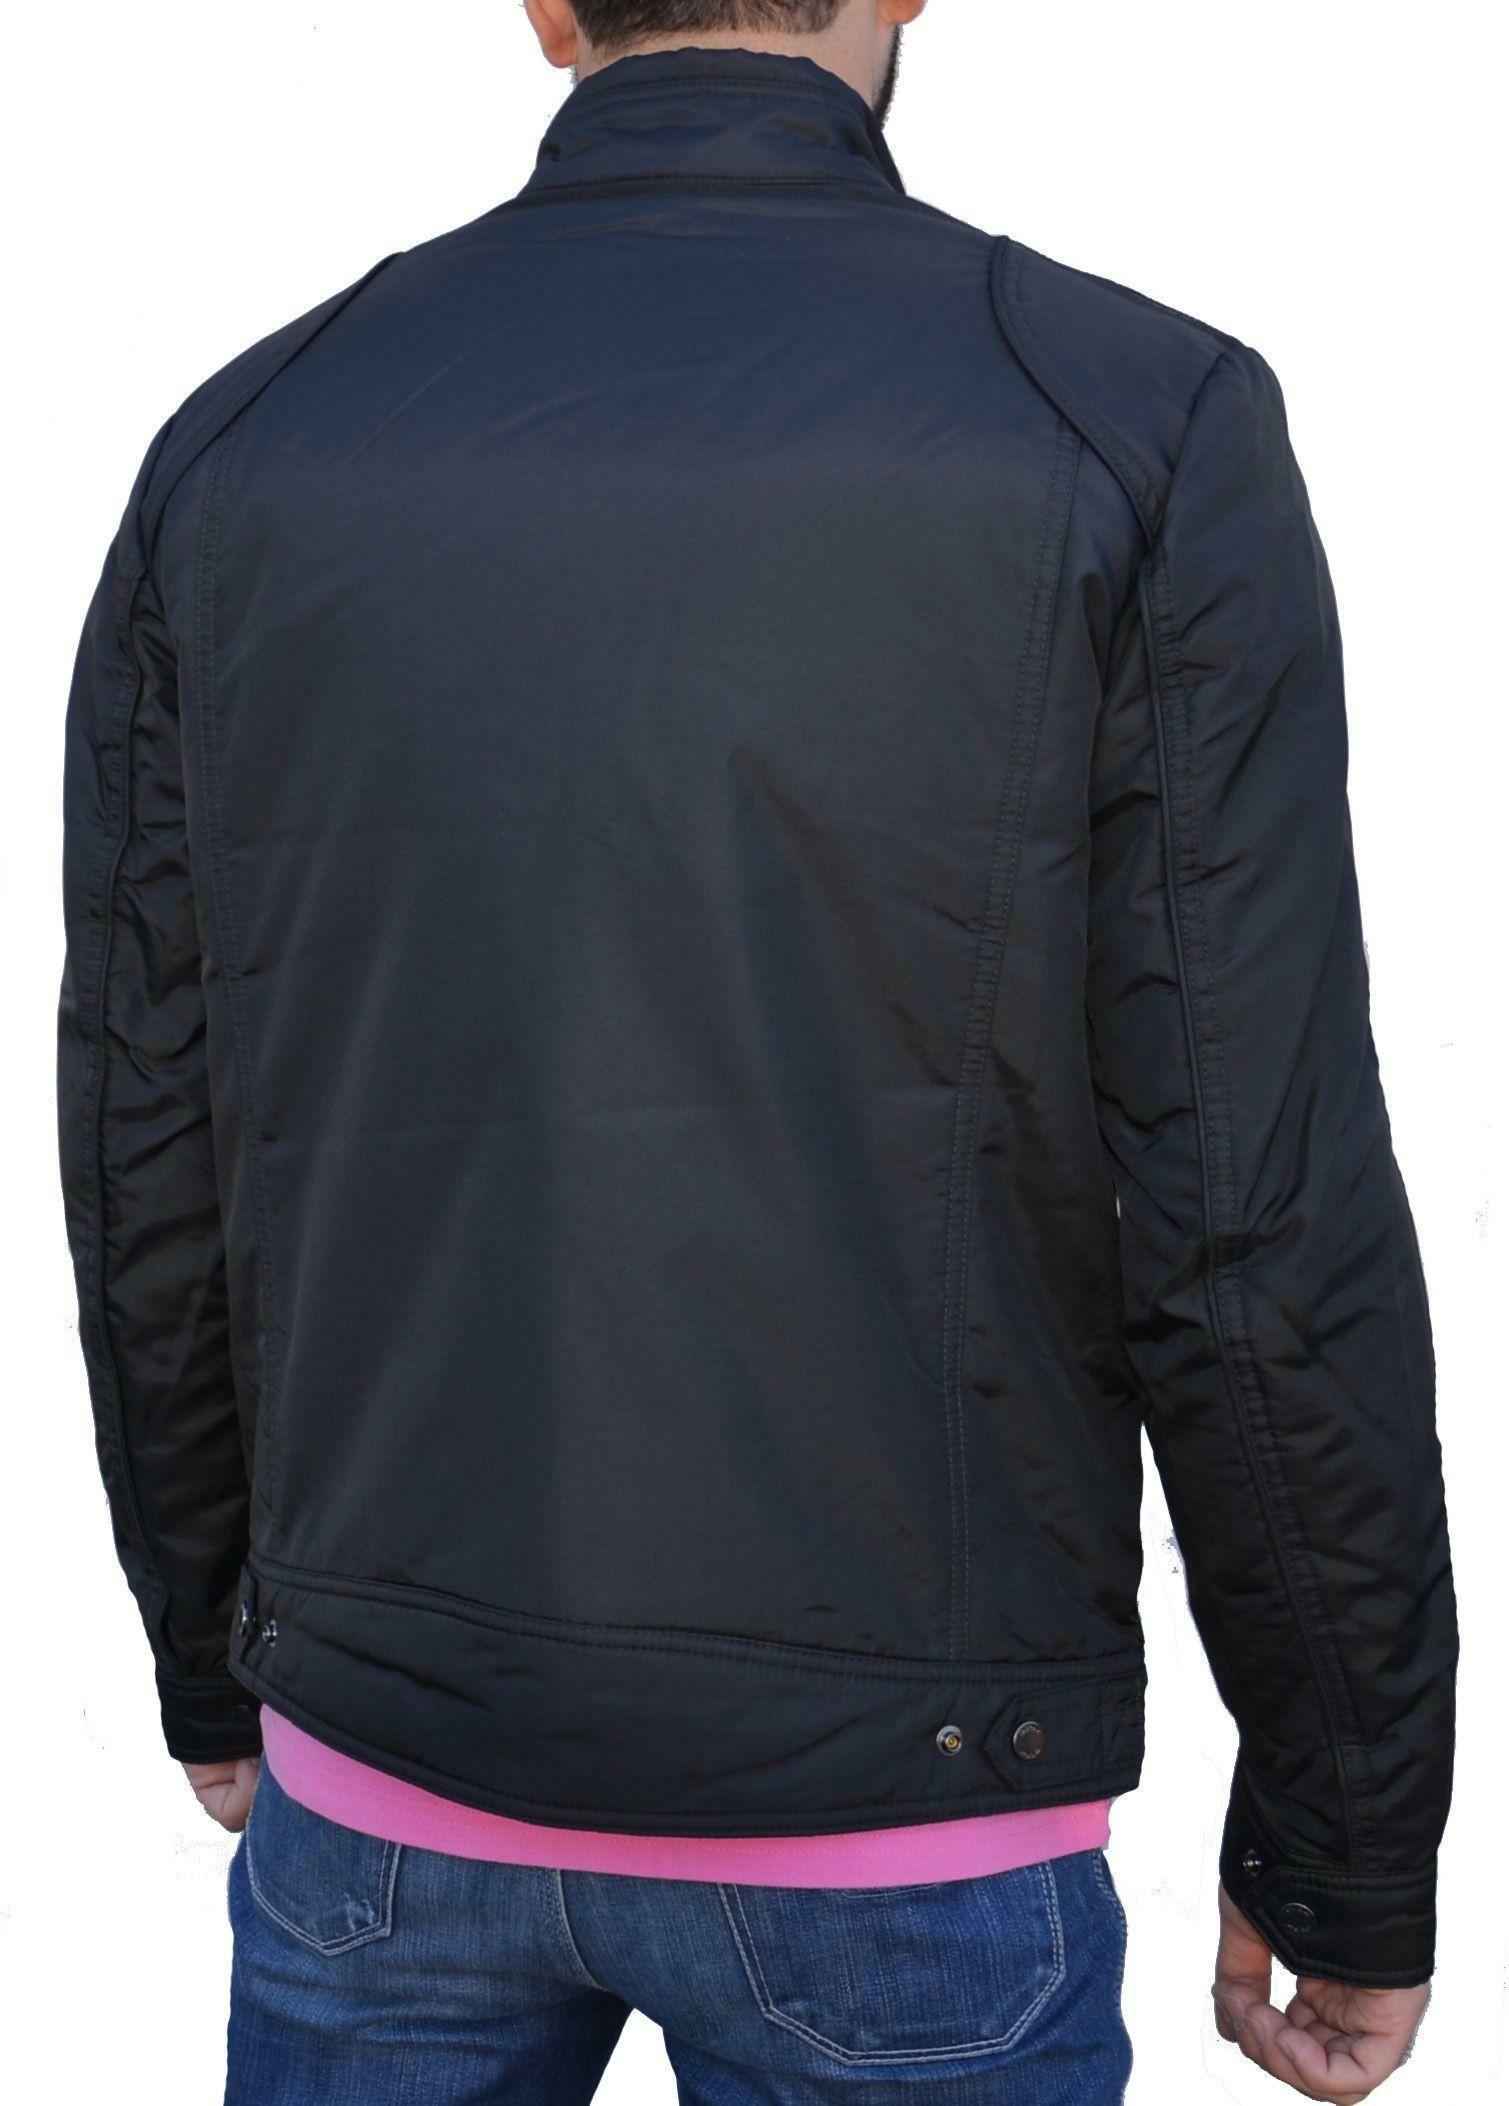 geox geox jacket man giubbotto uomo nero